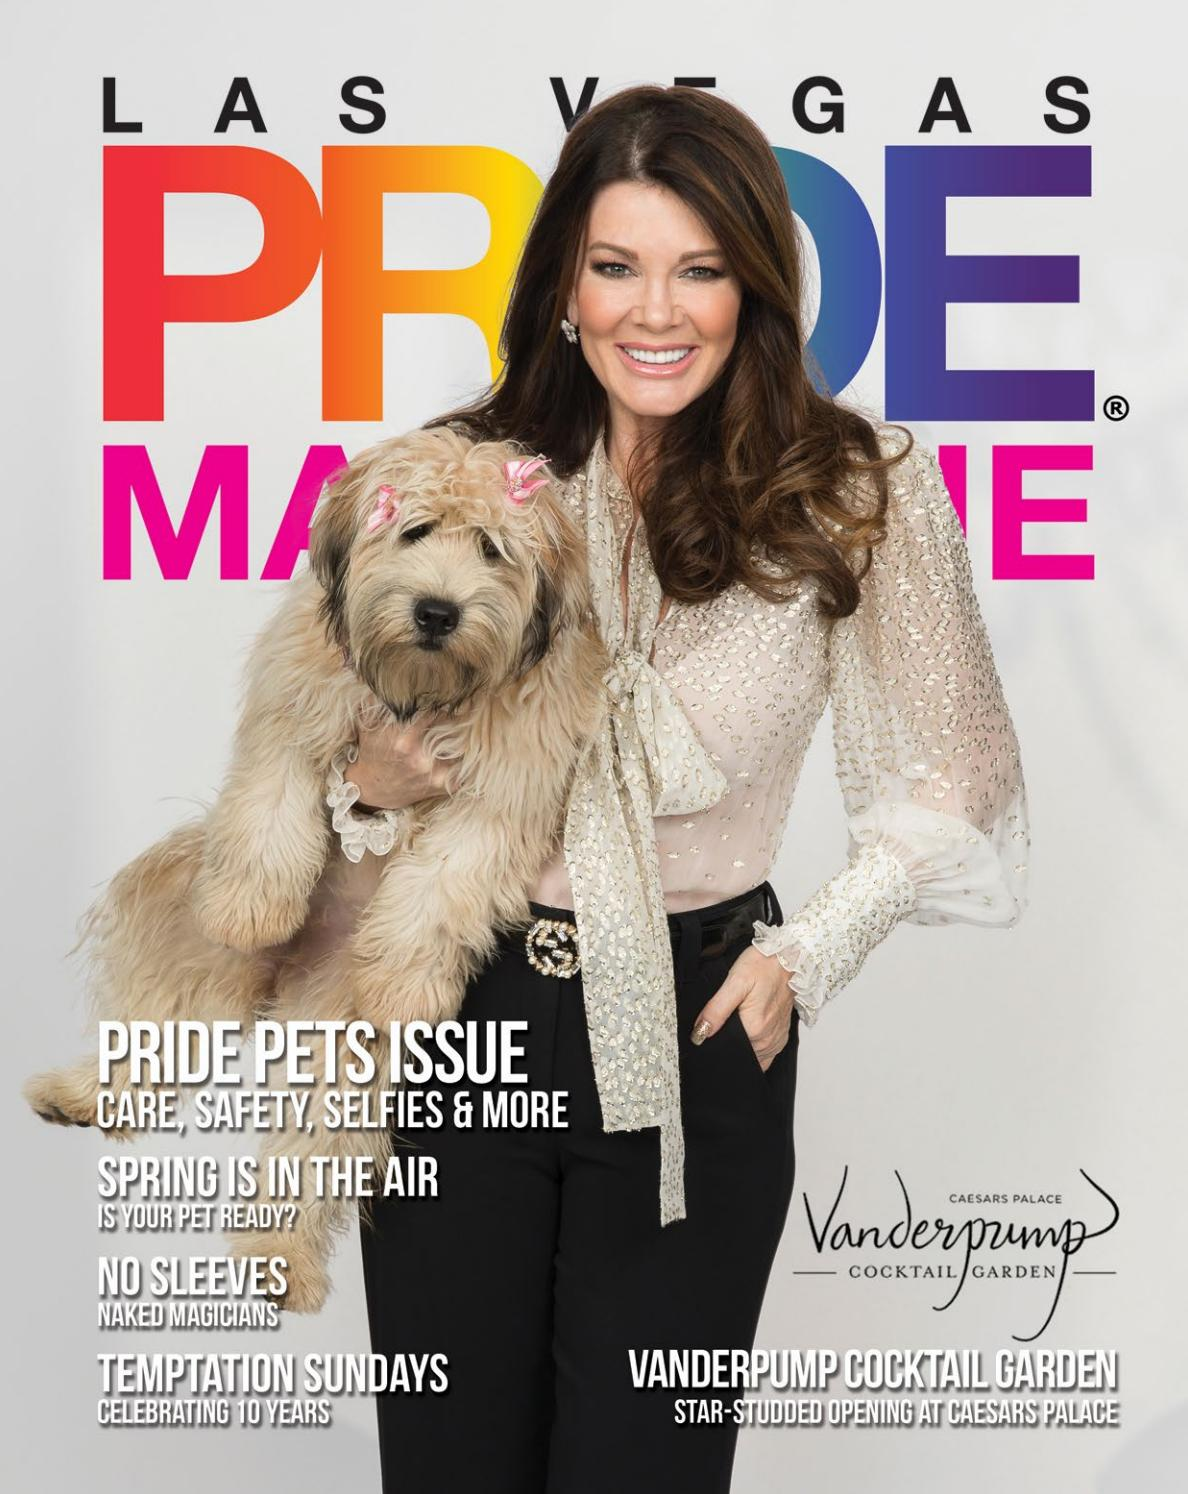 Las Vegas PRIDE Magazine - Issue 26 by Las Vegas Pride - issuu